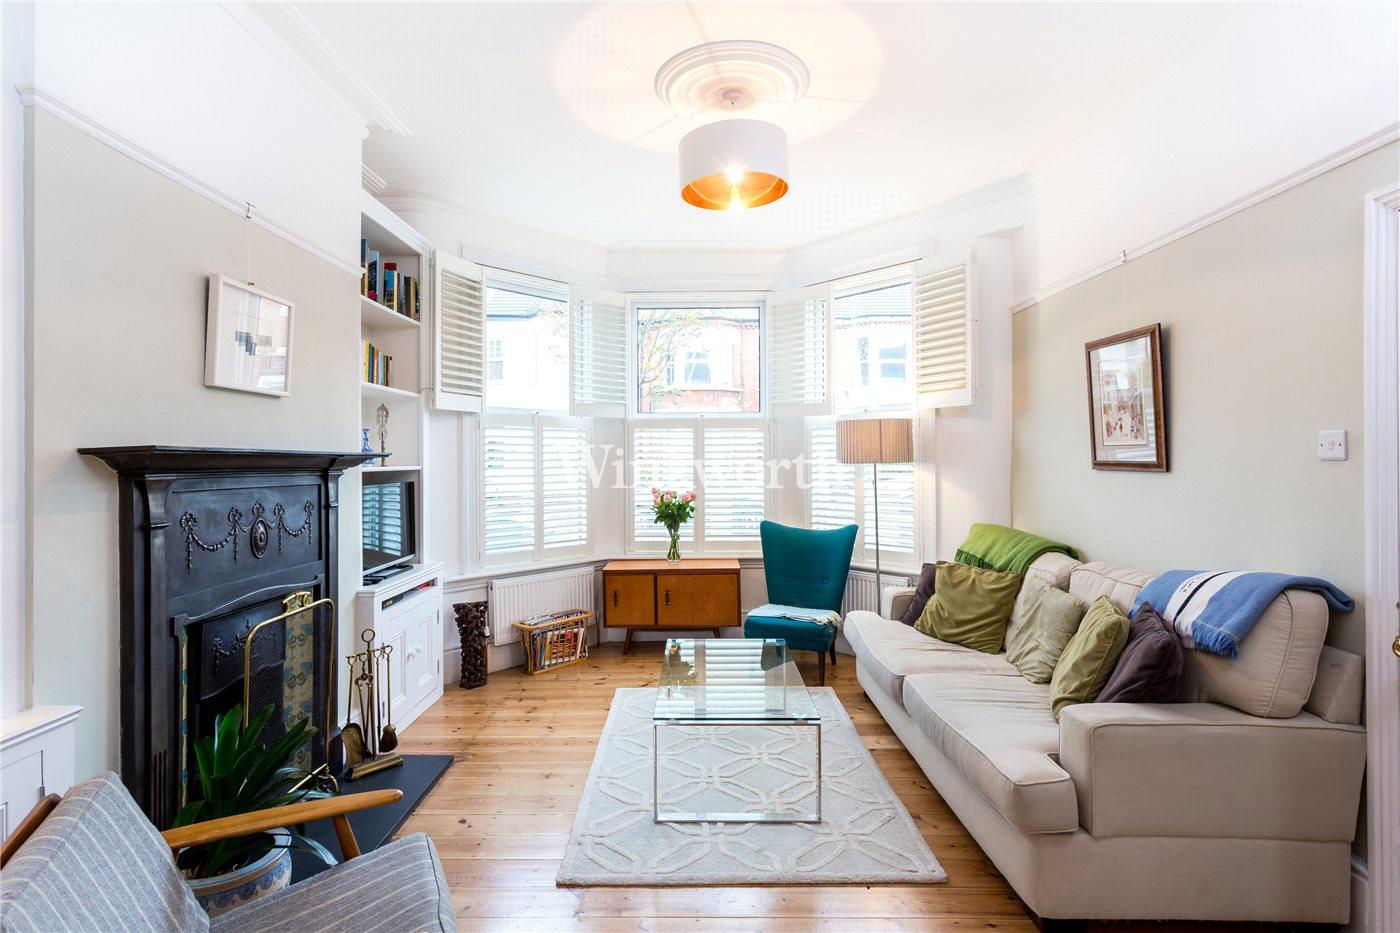 3 bedroom property to rent in Kitchener Road, London, N17 - £2100 pcm